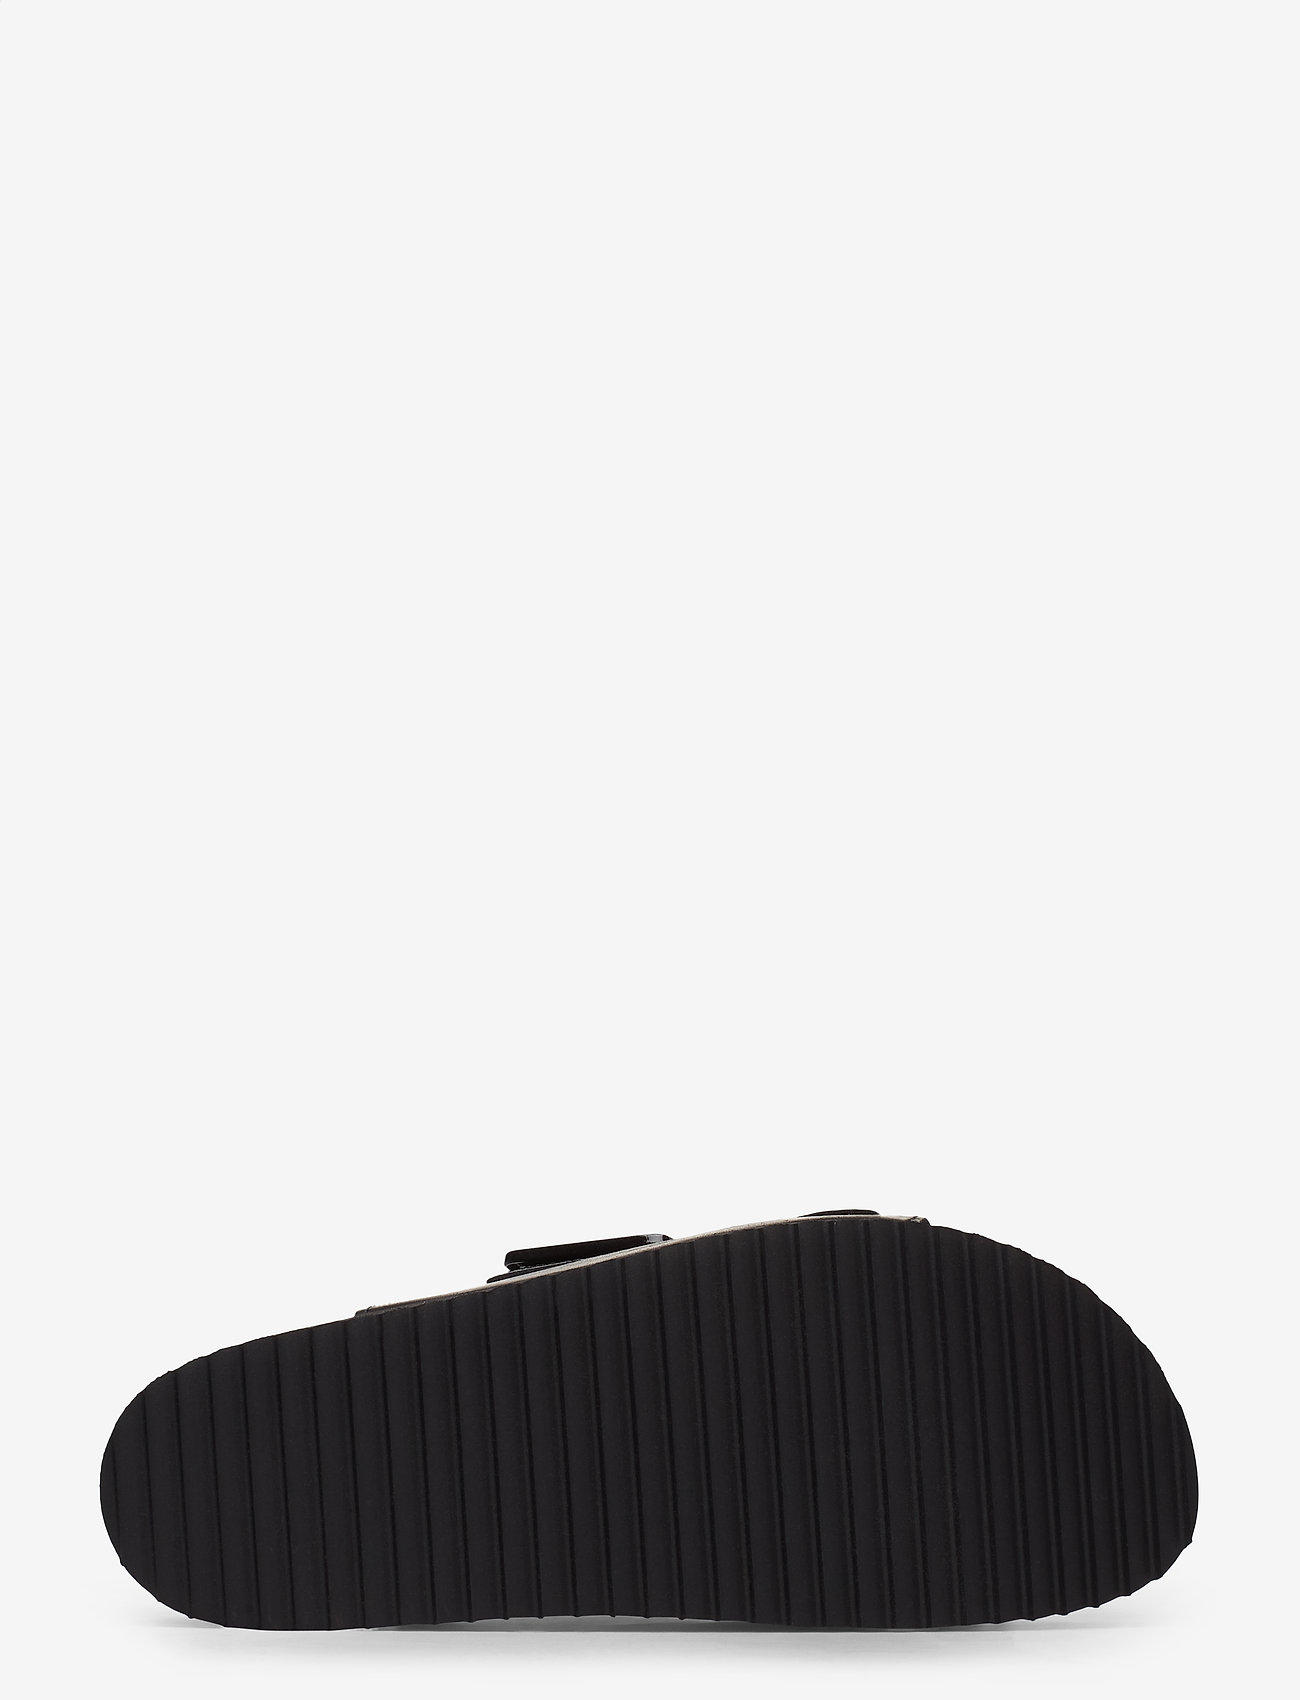 Stb-cara Platform L (Black) - Shoe The Bear